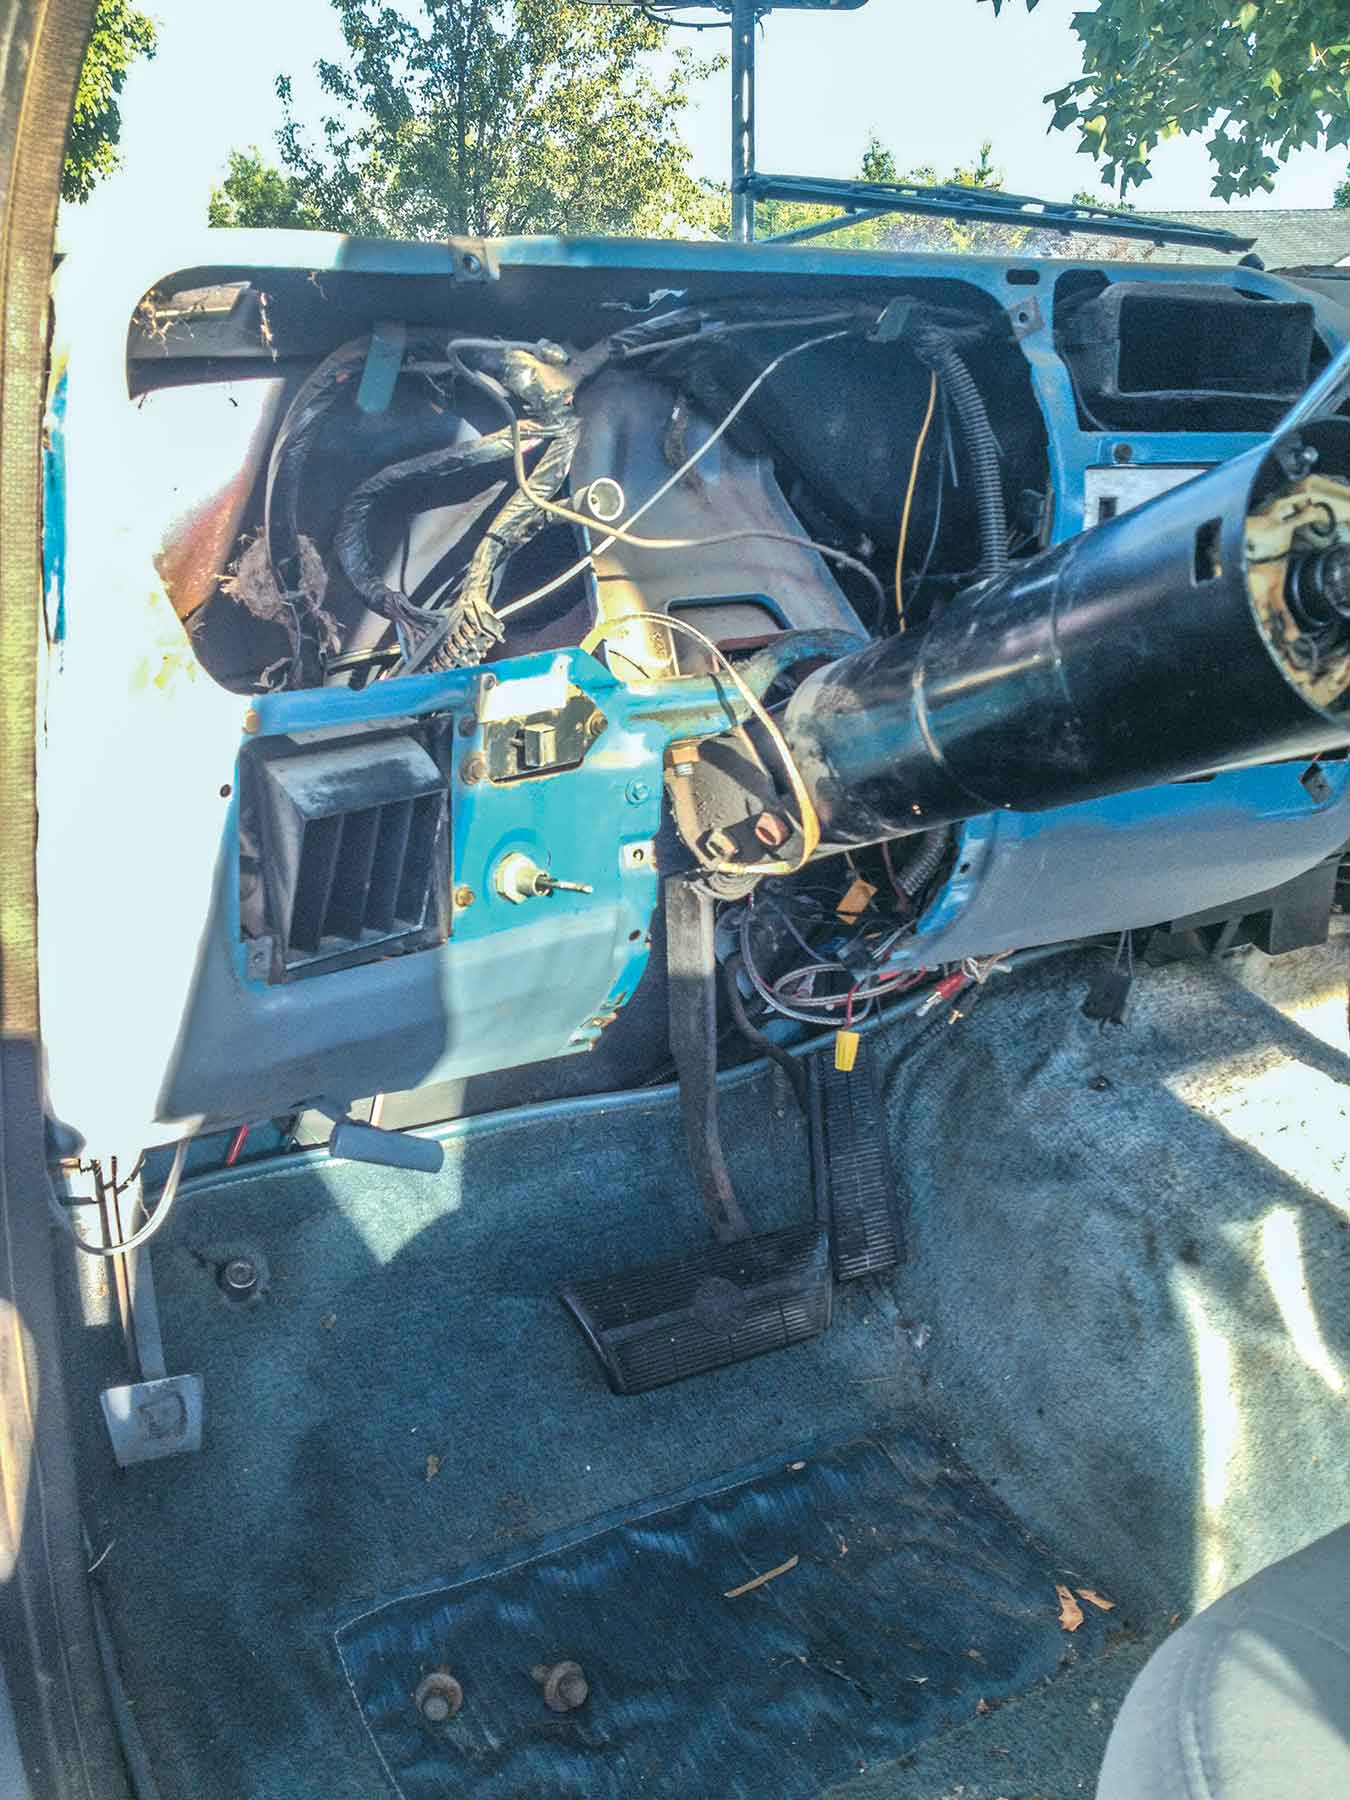 Truck Bed Accessories >> 1973 Chevy K5 Blazer - Kylie Cereghino - LMC Truck Life